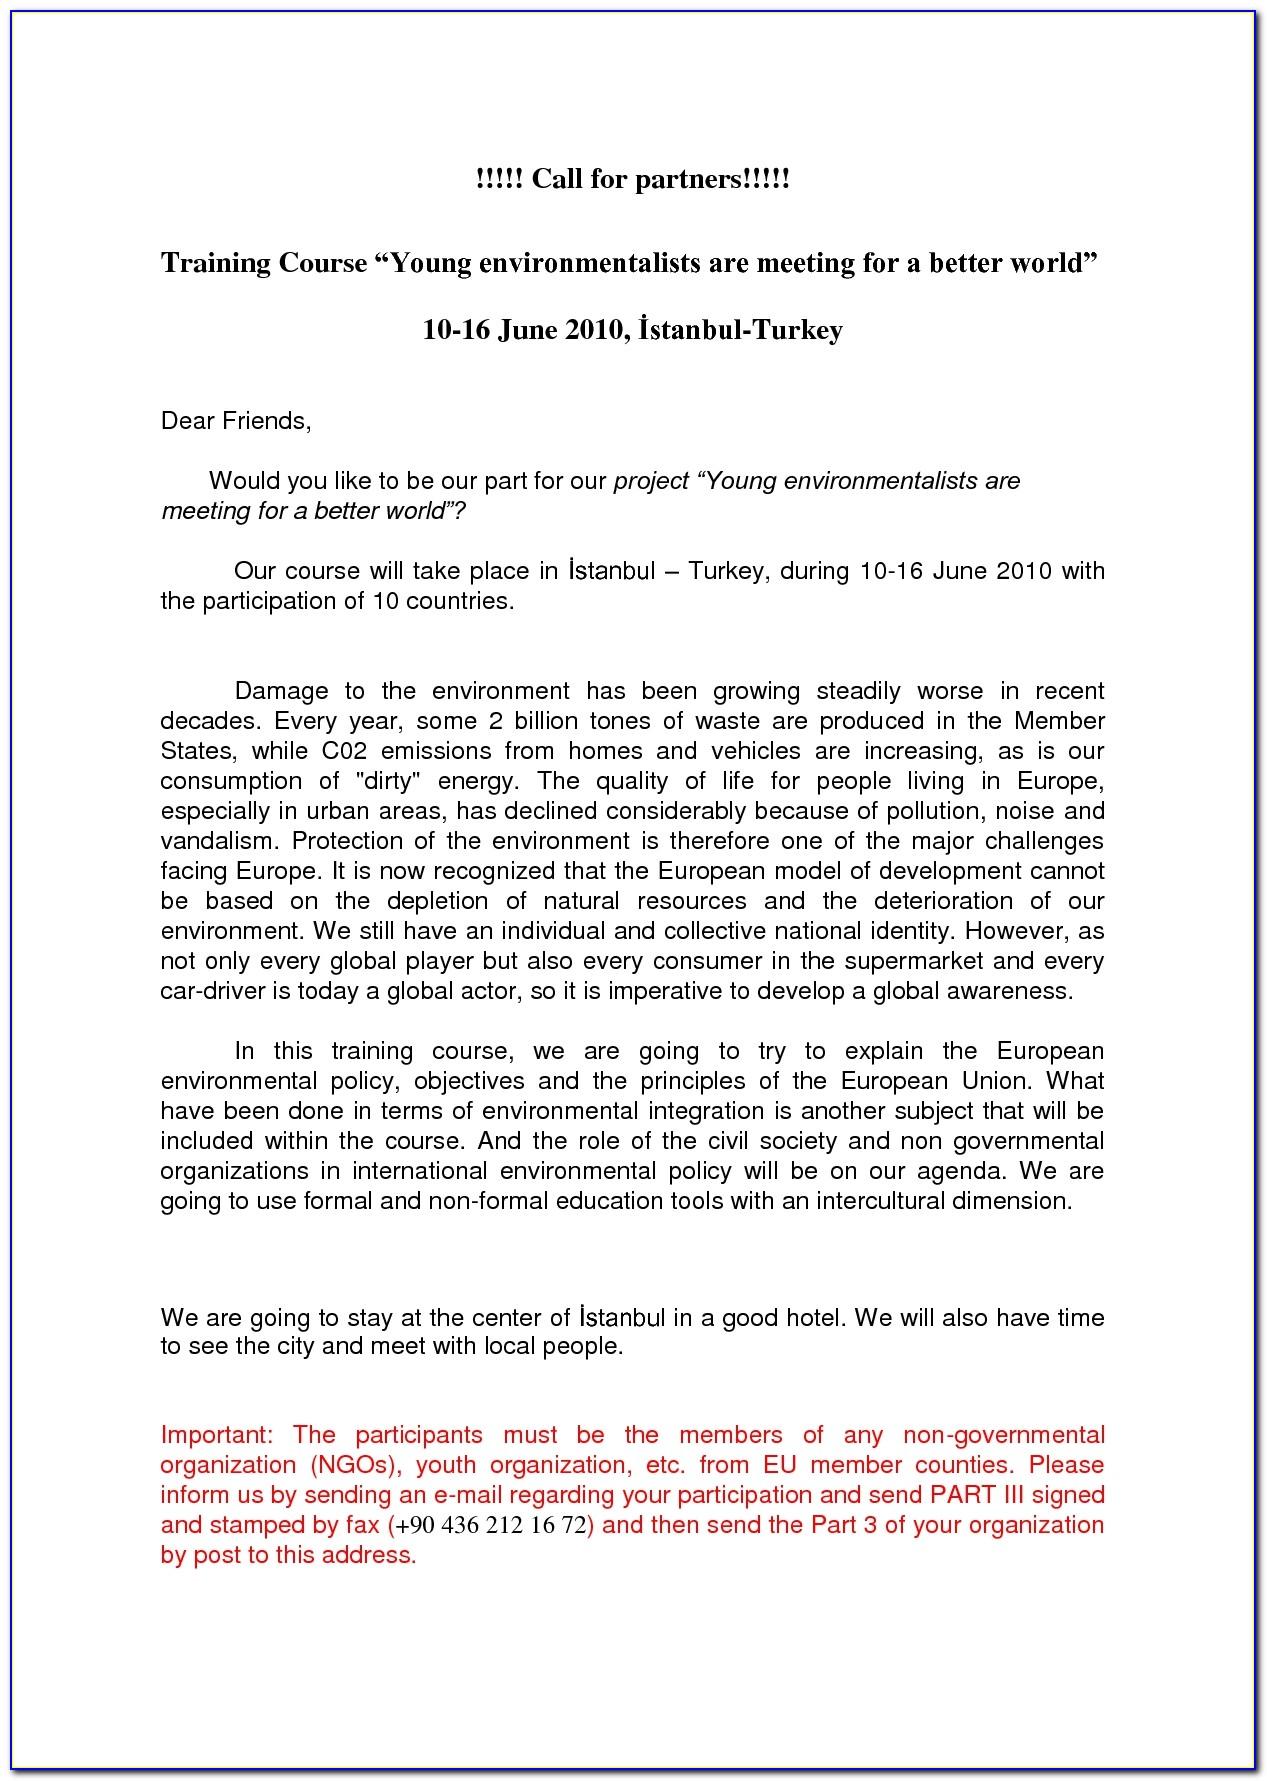 Cover Letter Format For Uk Tourist Visa With Regard To Letter Of Invitation For Uk Visa Template